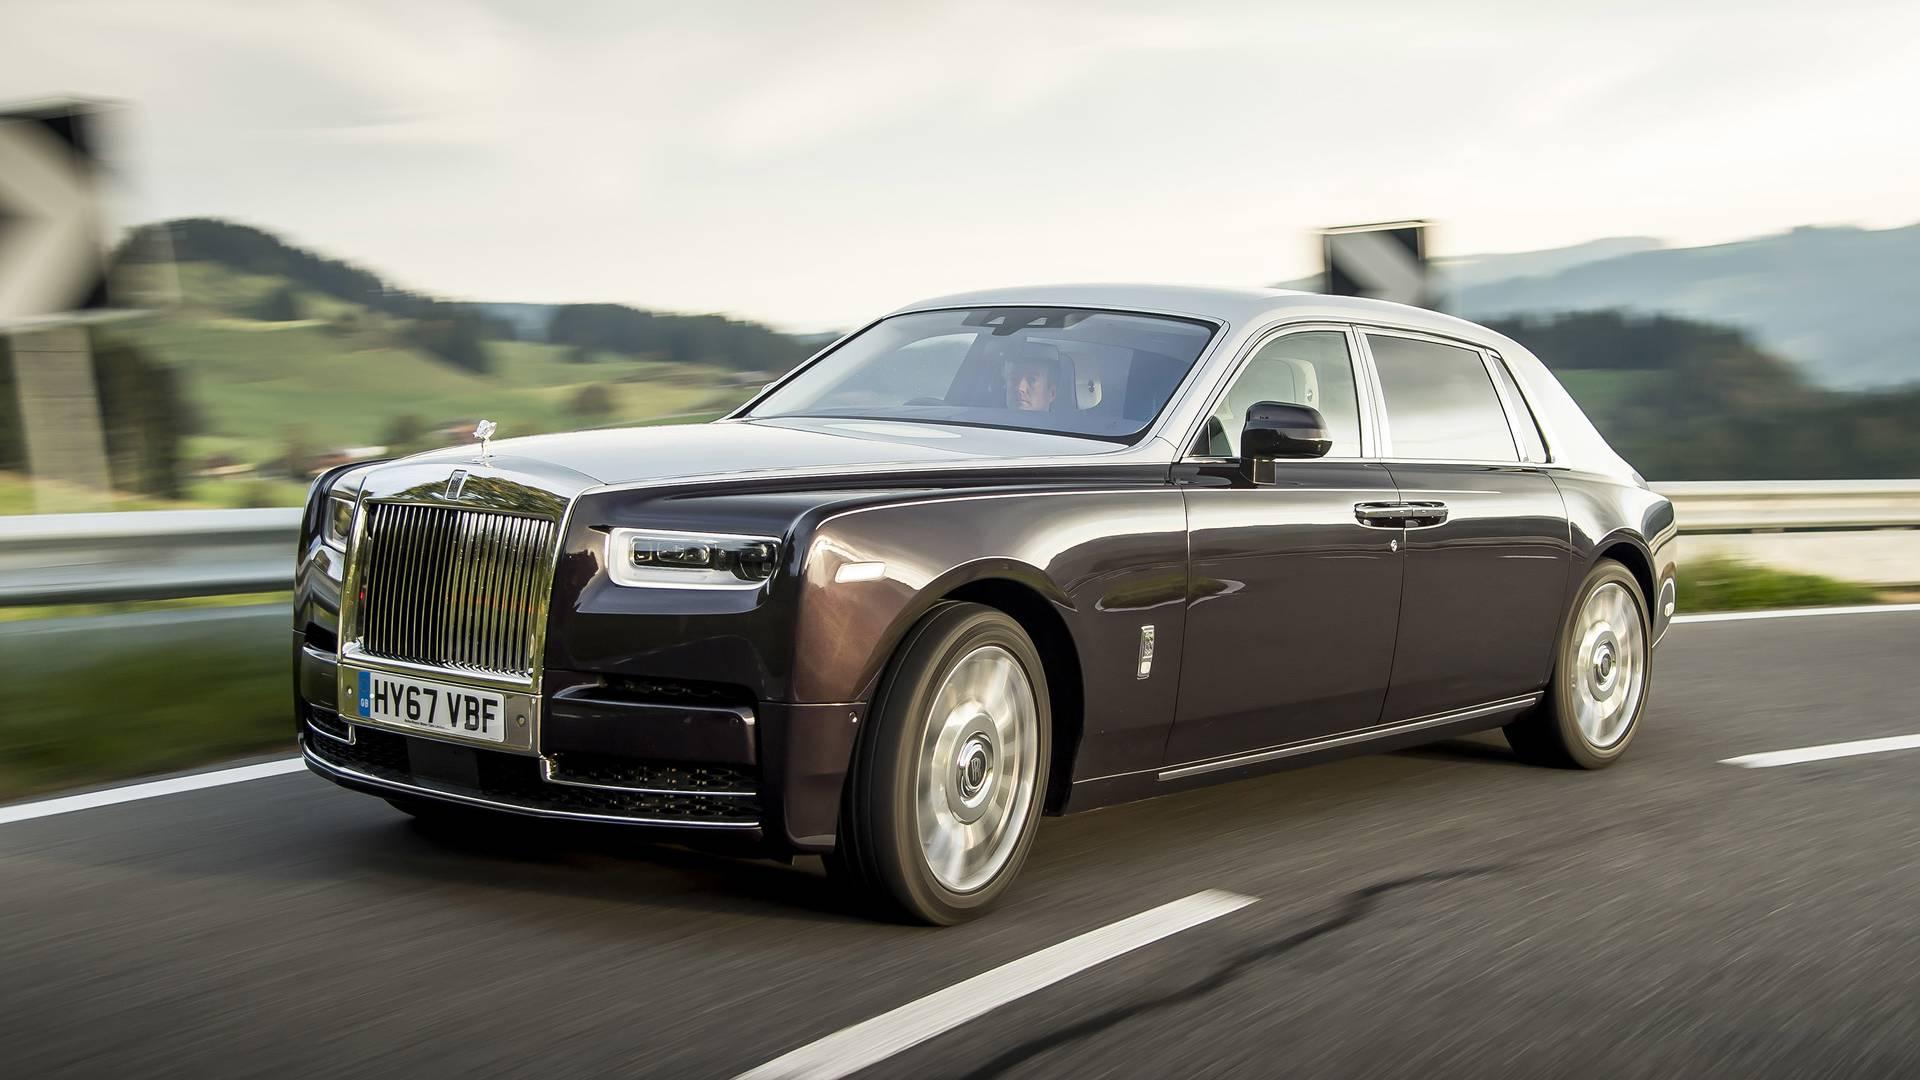 100 roll royce fantom rolls royce motor cars showcases bespoke expertise at beijing 2018. Black Bedroom Furniture Sets. Home Design Ideas